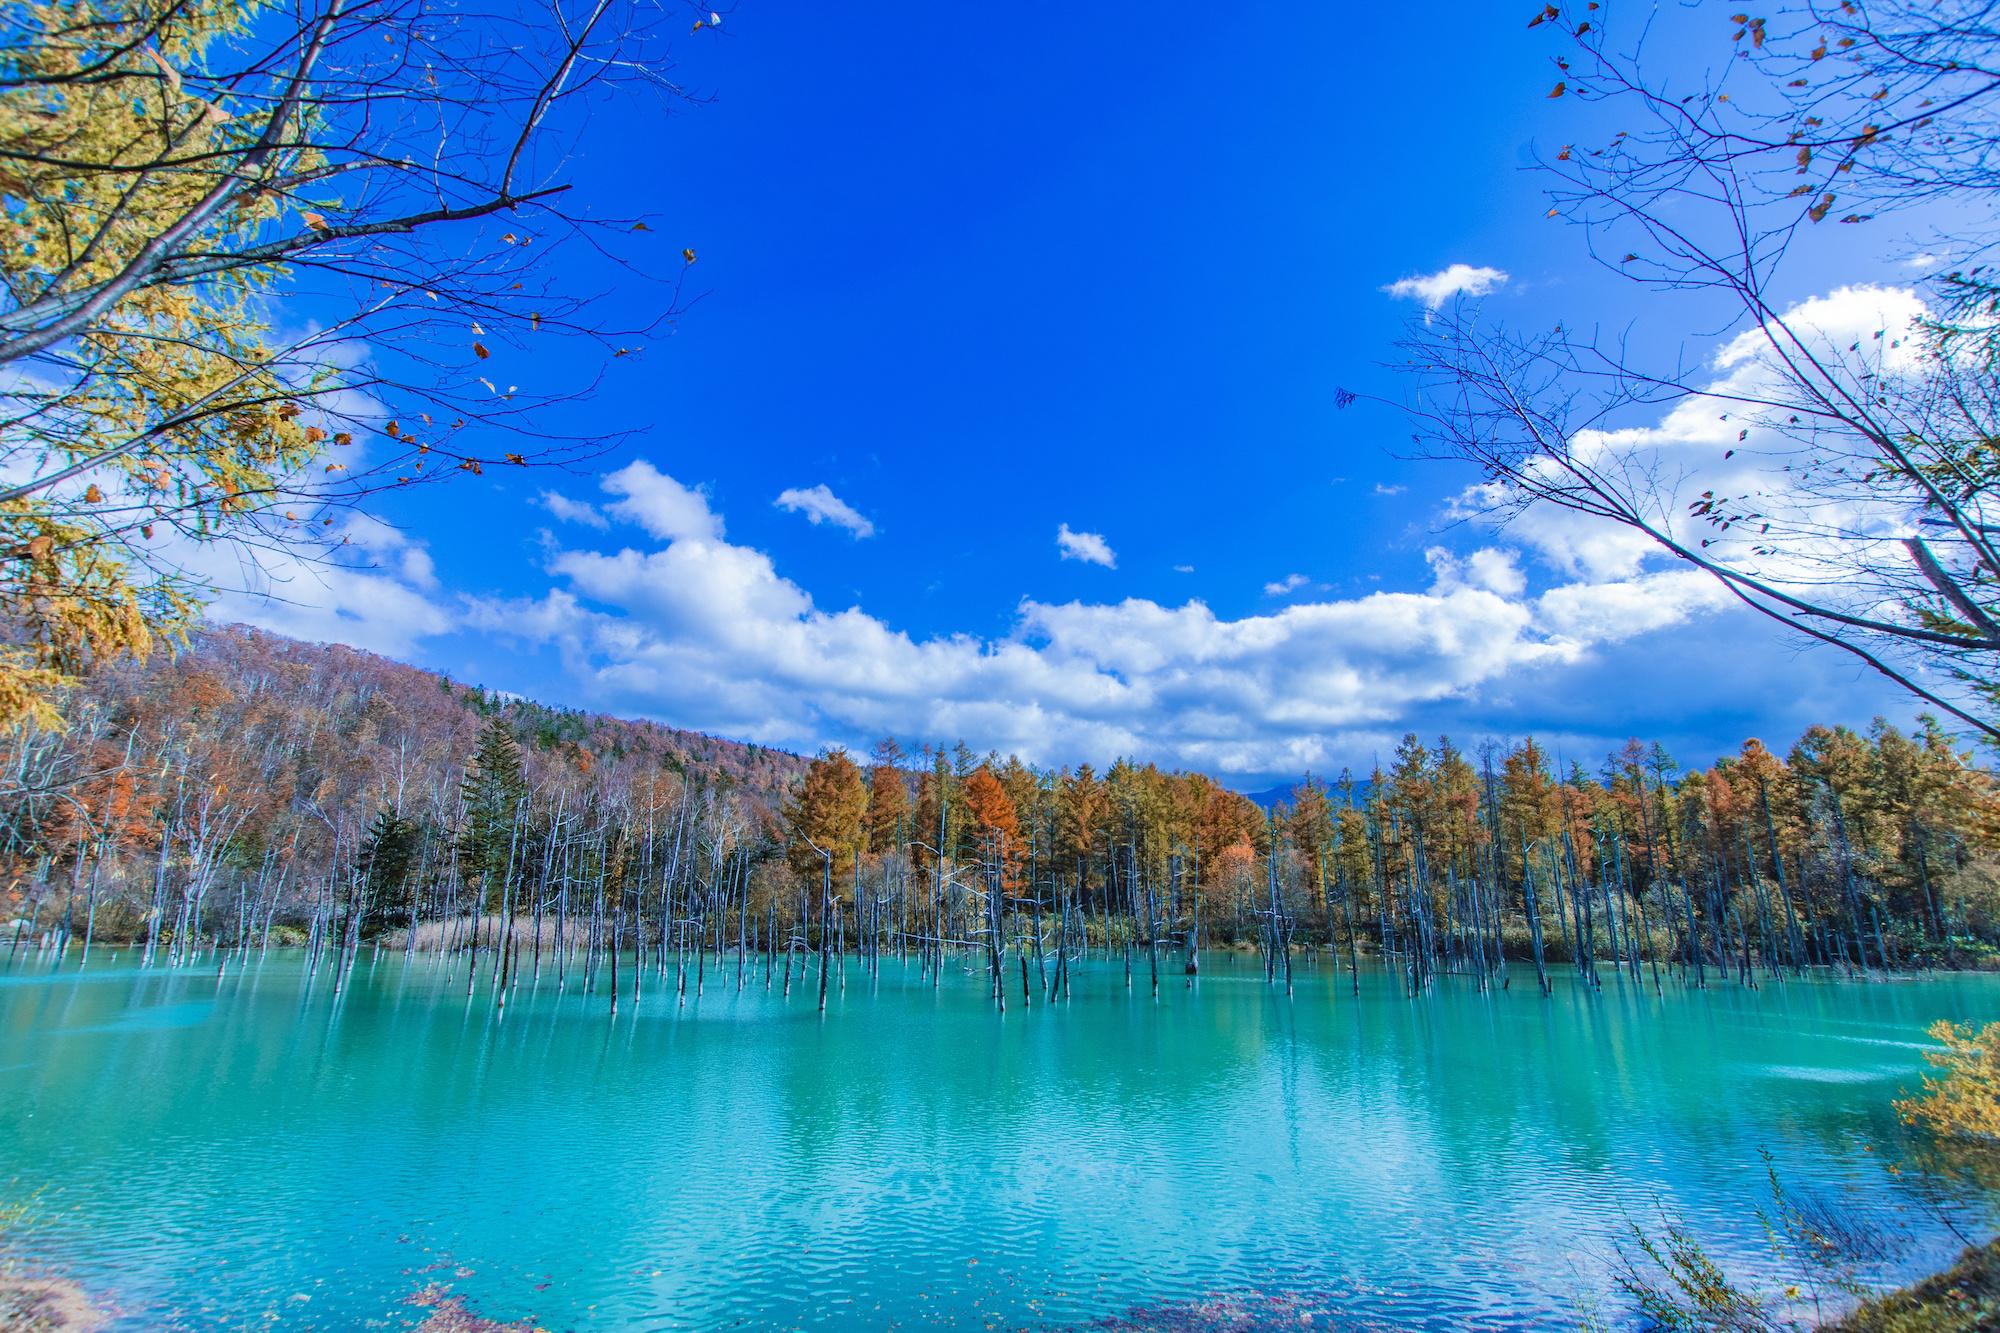 Aoike: The Mesmerizing Blue Pond of Hokkaido